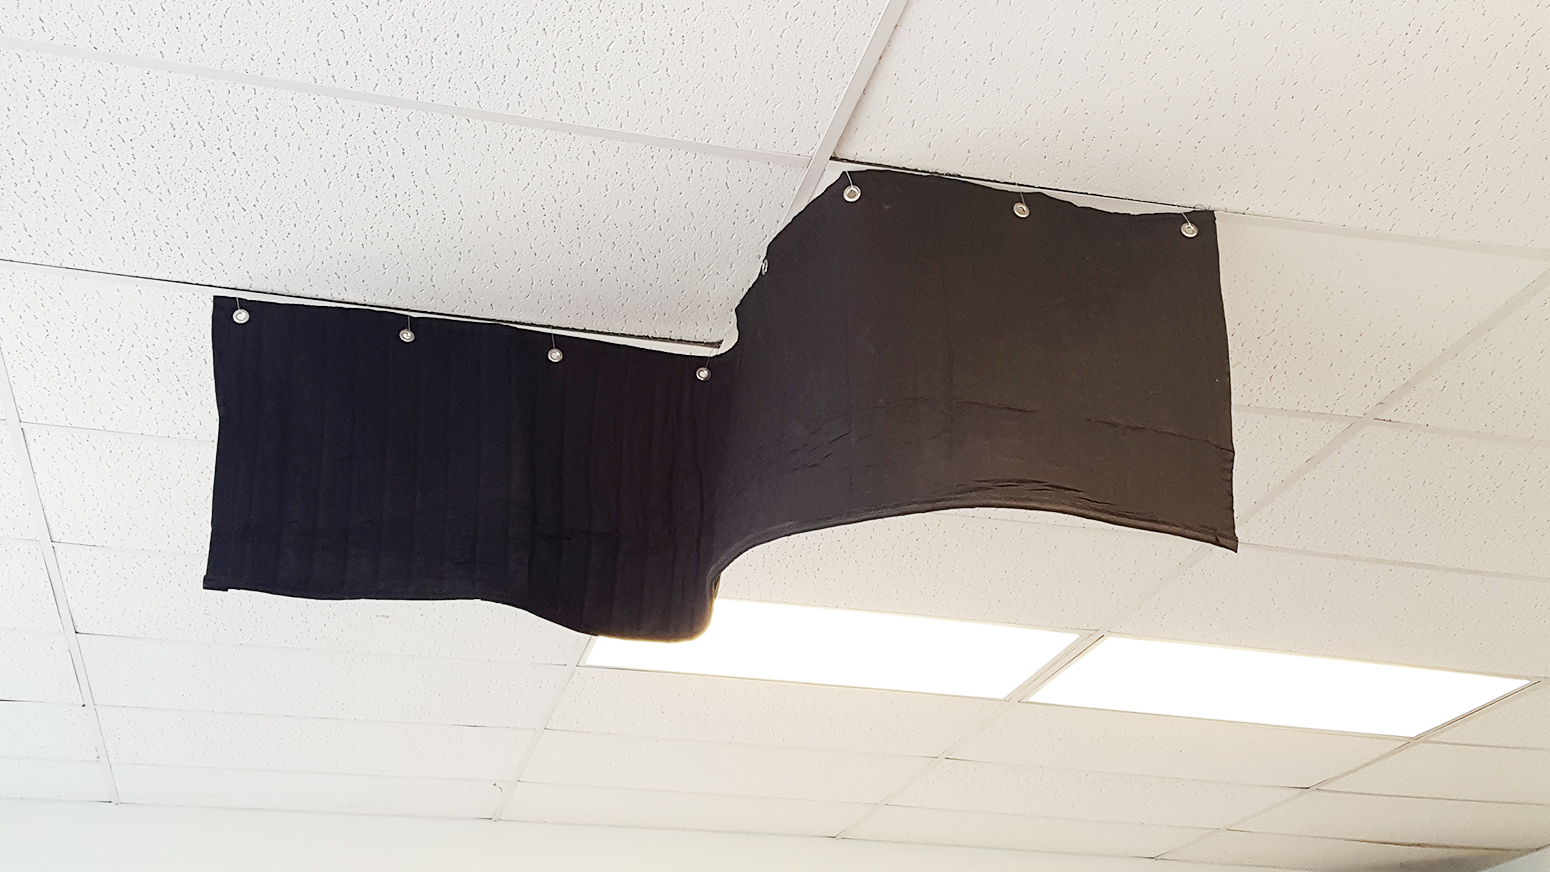 Ceiling sound baffle blanket for sound absorption